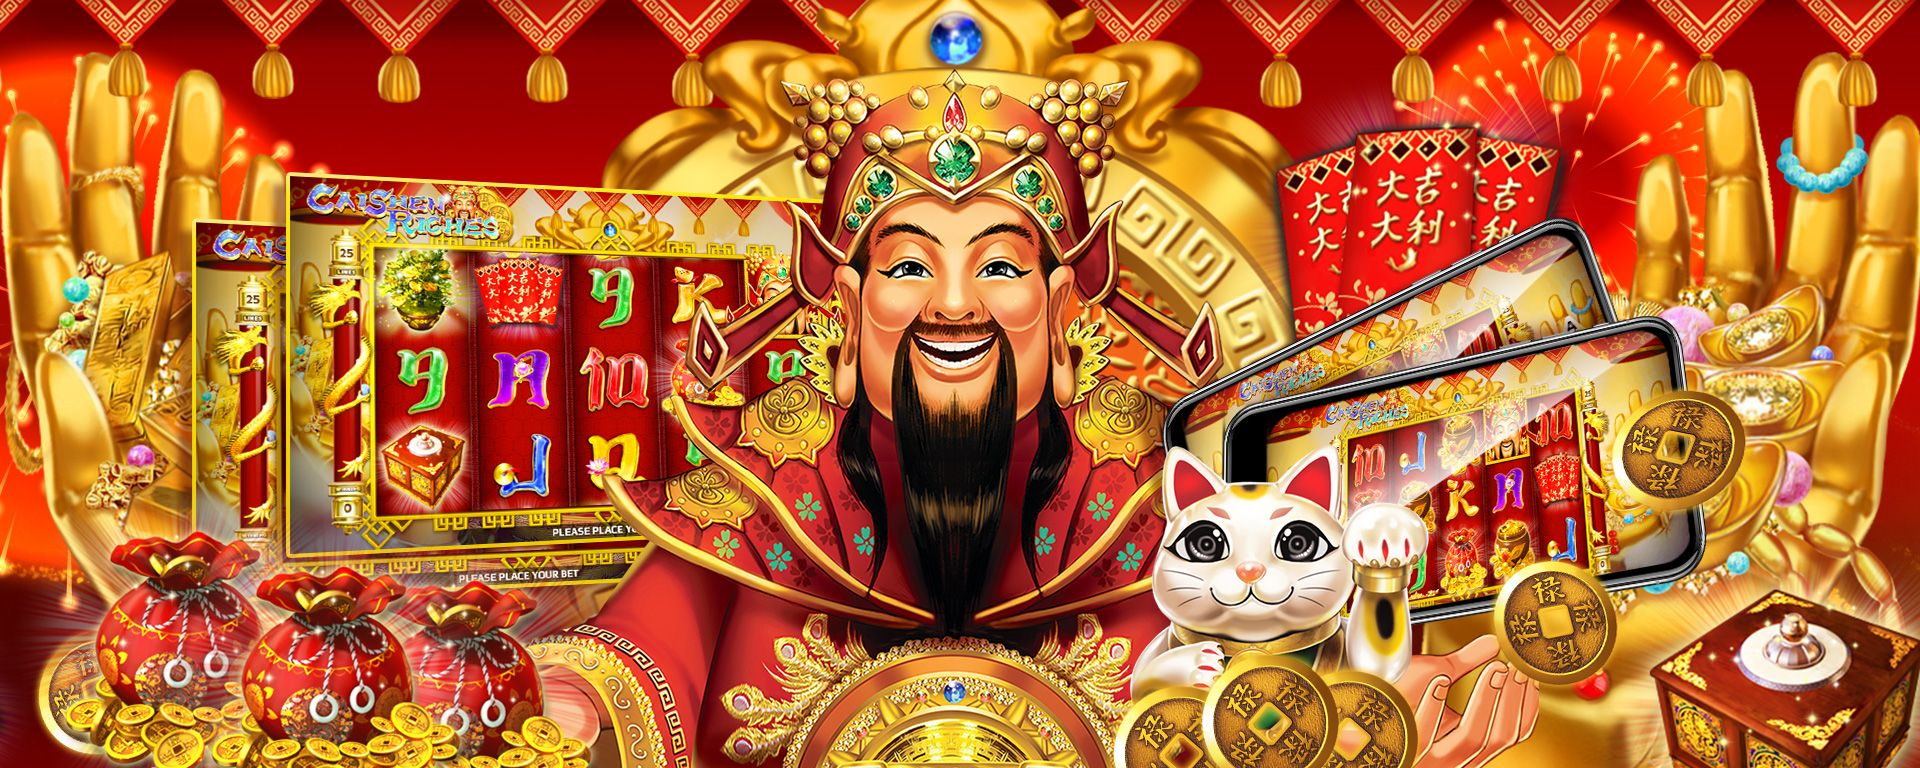 Jokerindo99 Joker123 Joker388 Slot Online Terbaru Dan Terpercaya สล อตแมชช น เกม อ งเปา